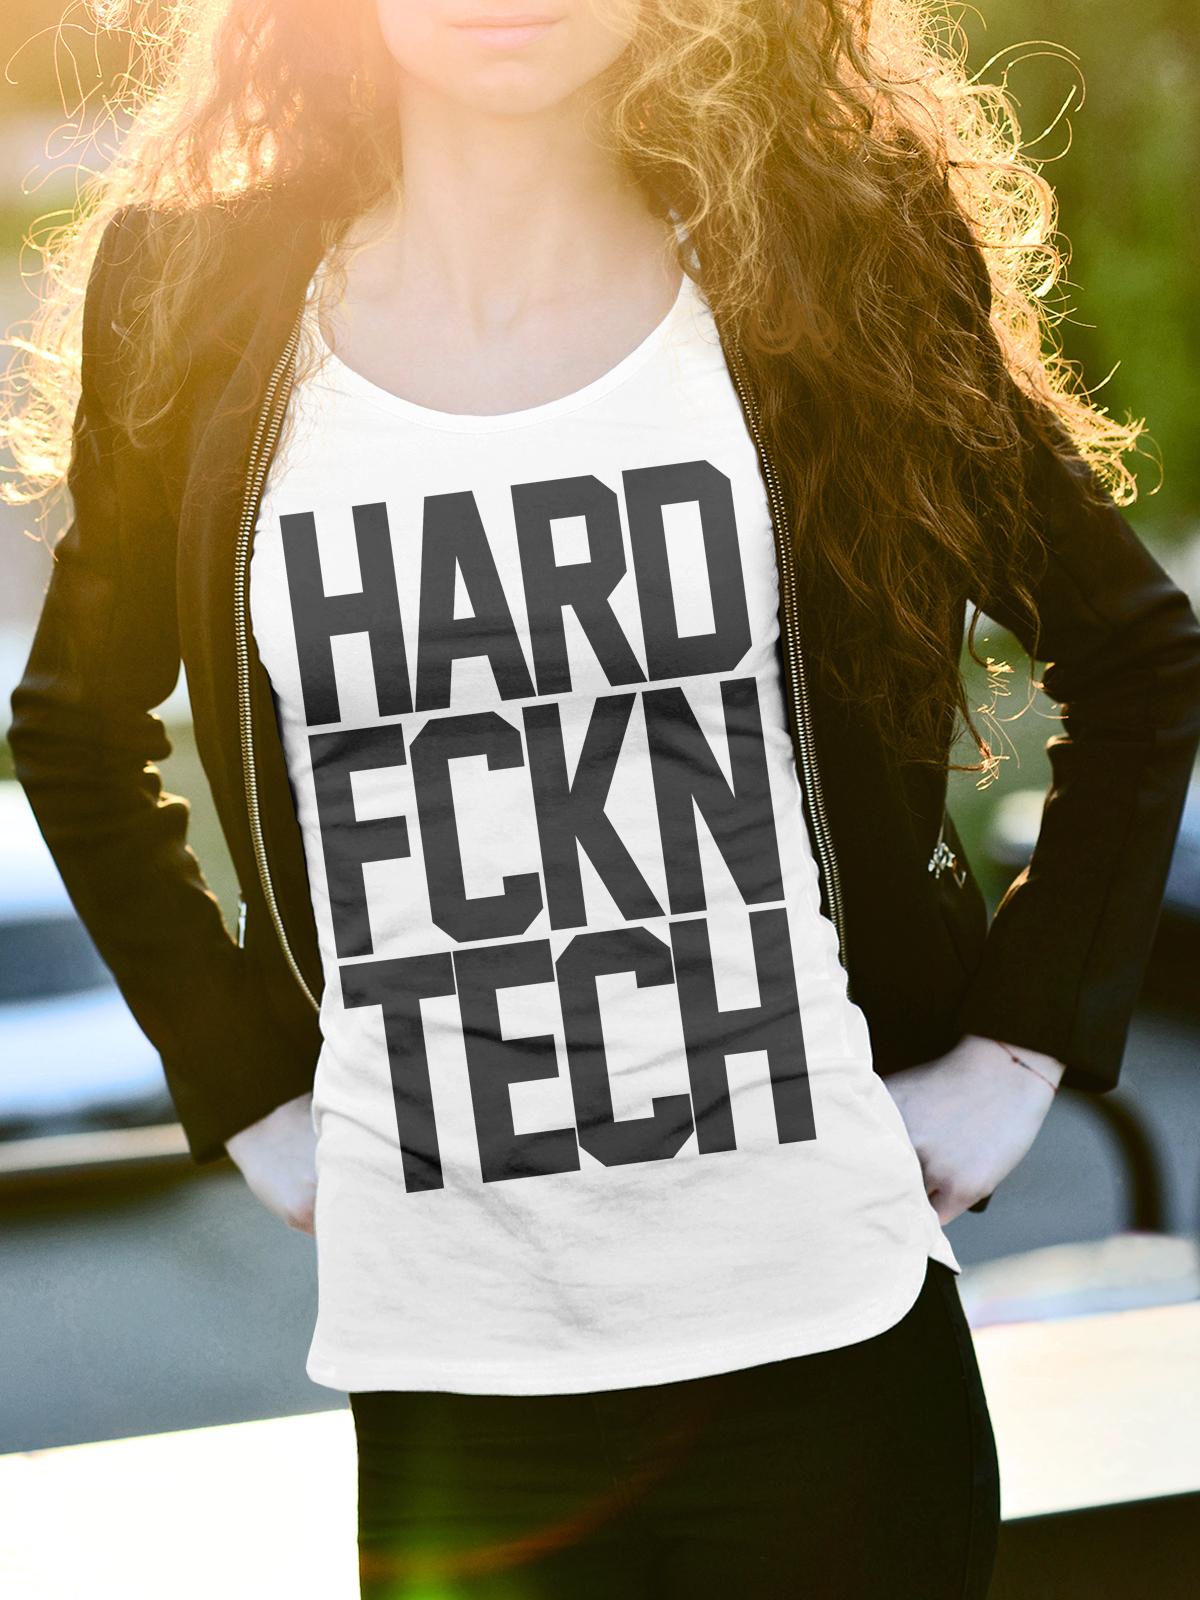 HARD FCKN TECH Női Póló - TECHNO STYLE 8ad5cbabcf